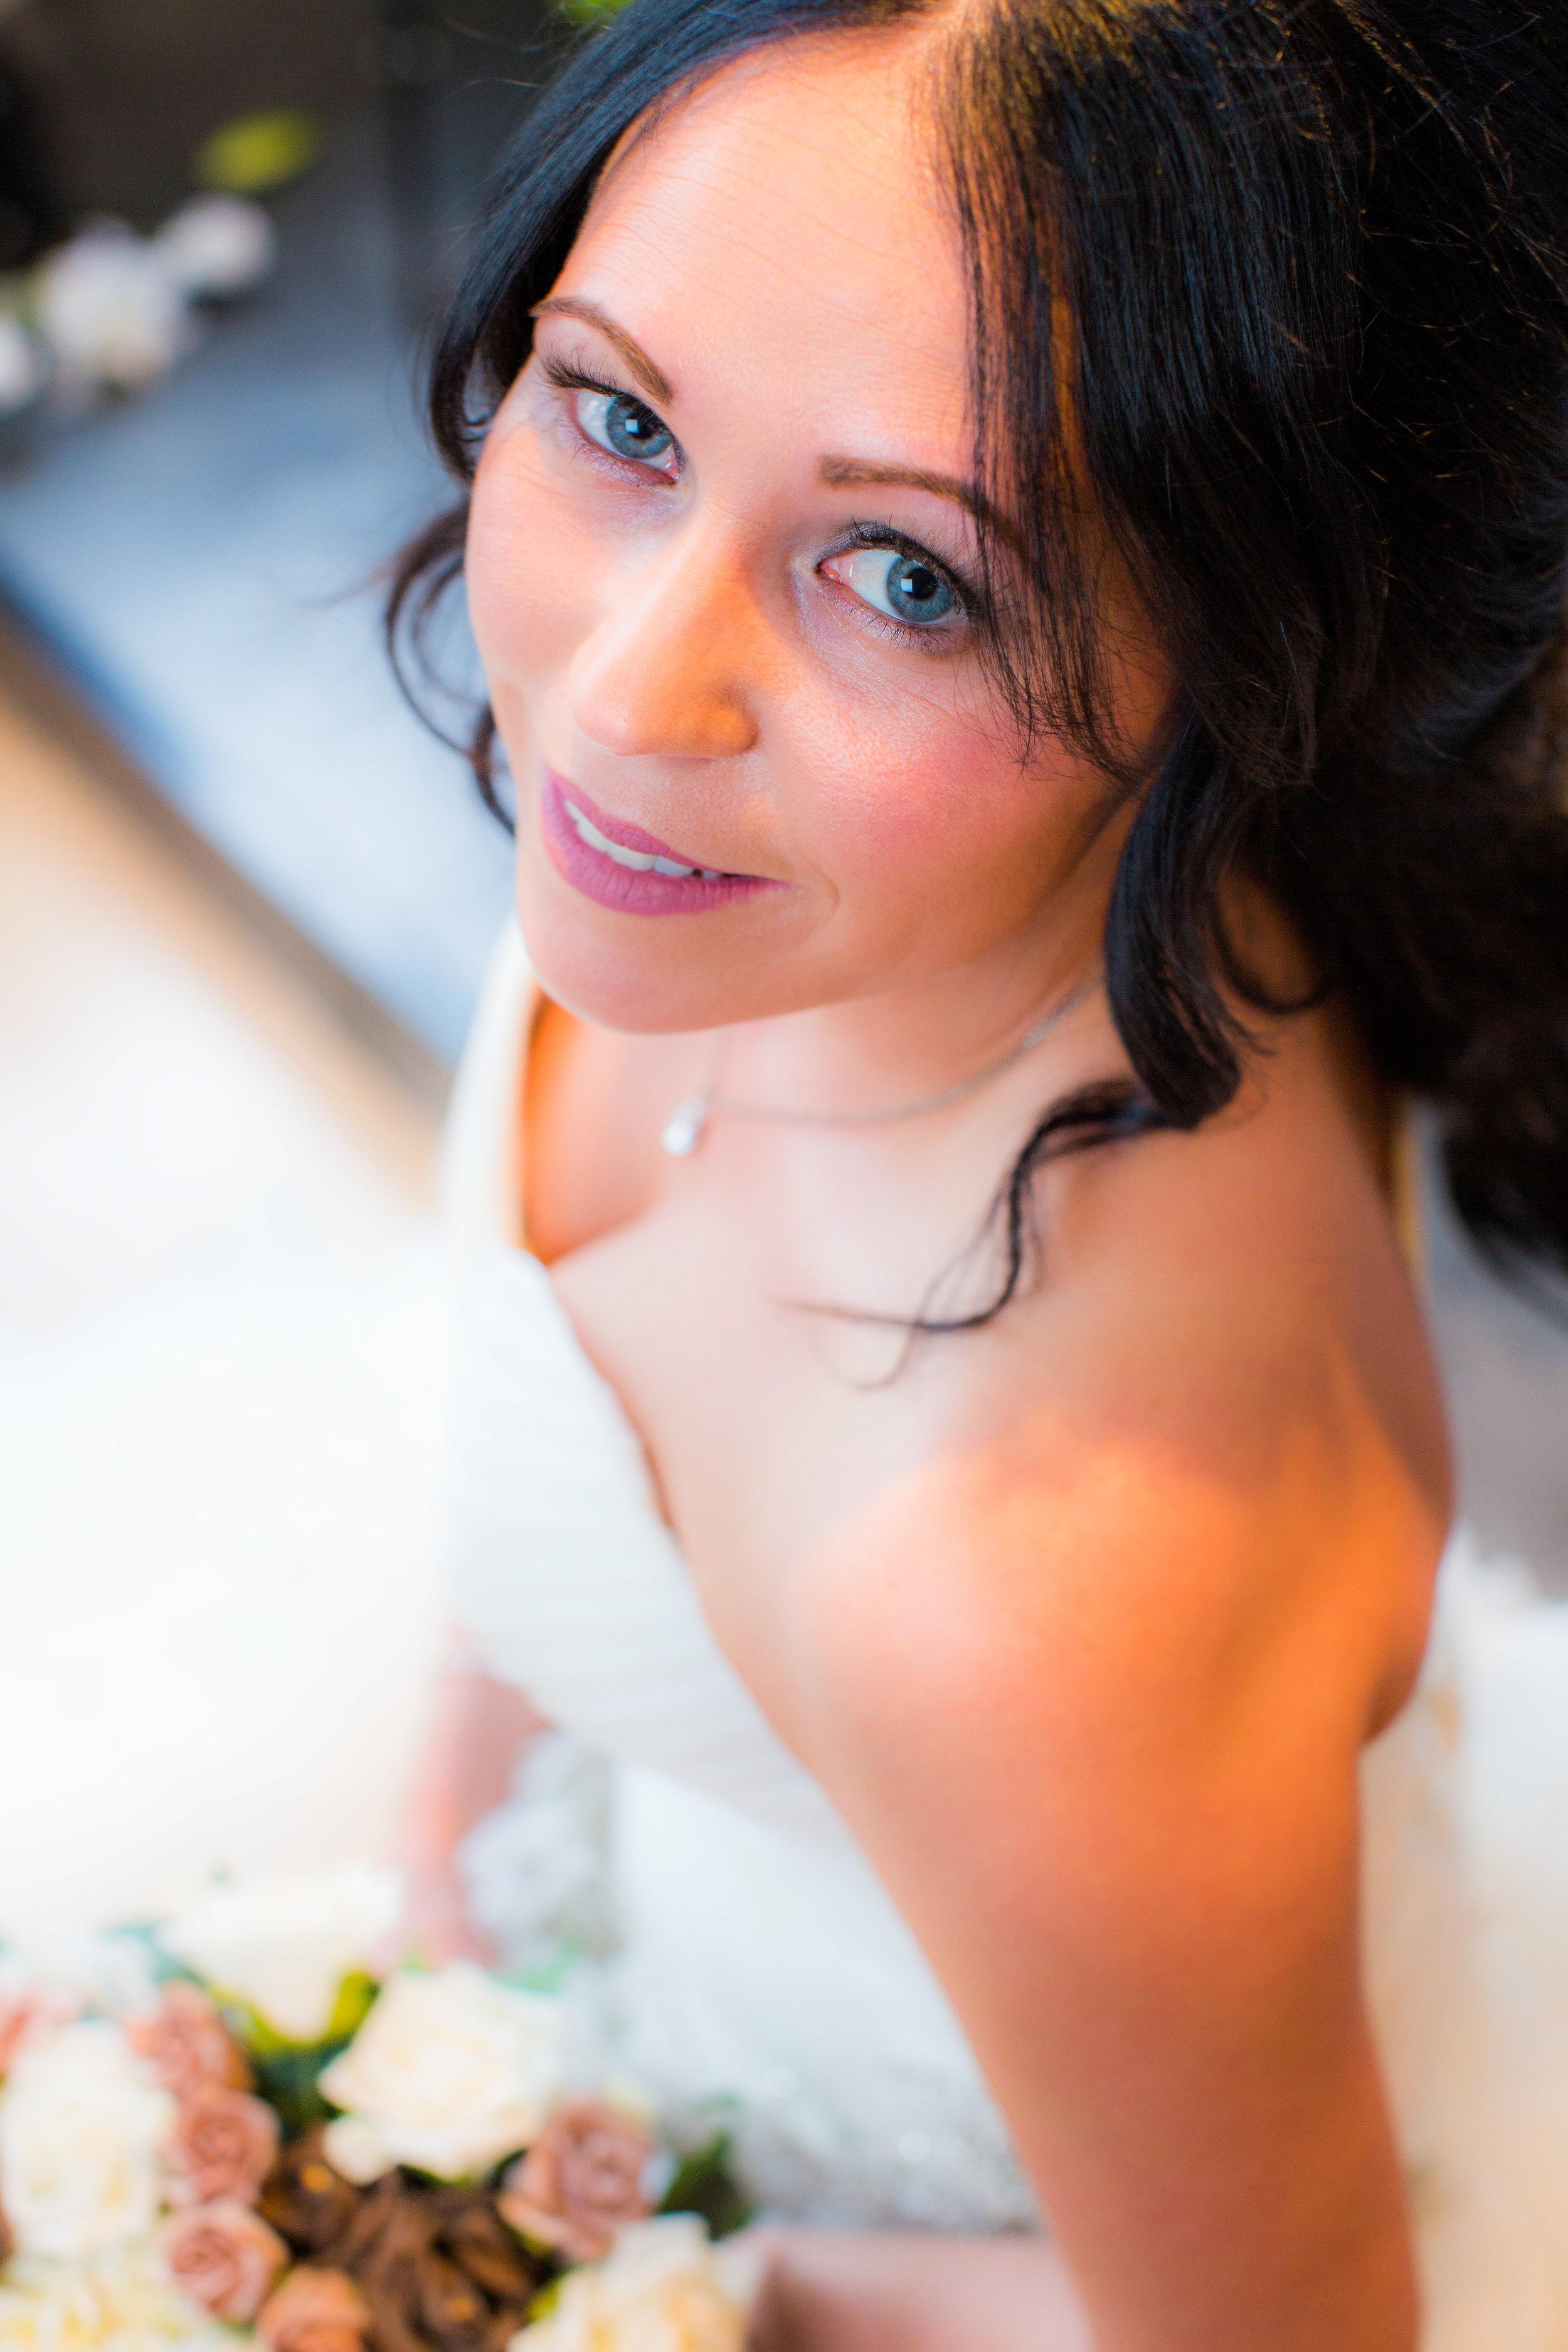 essex_wedding_photographer-4.jpg